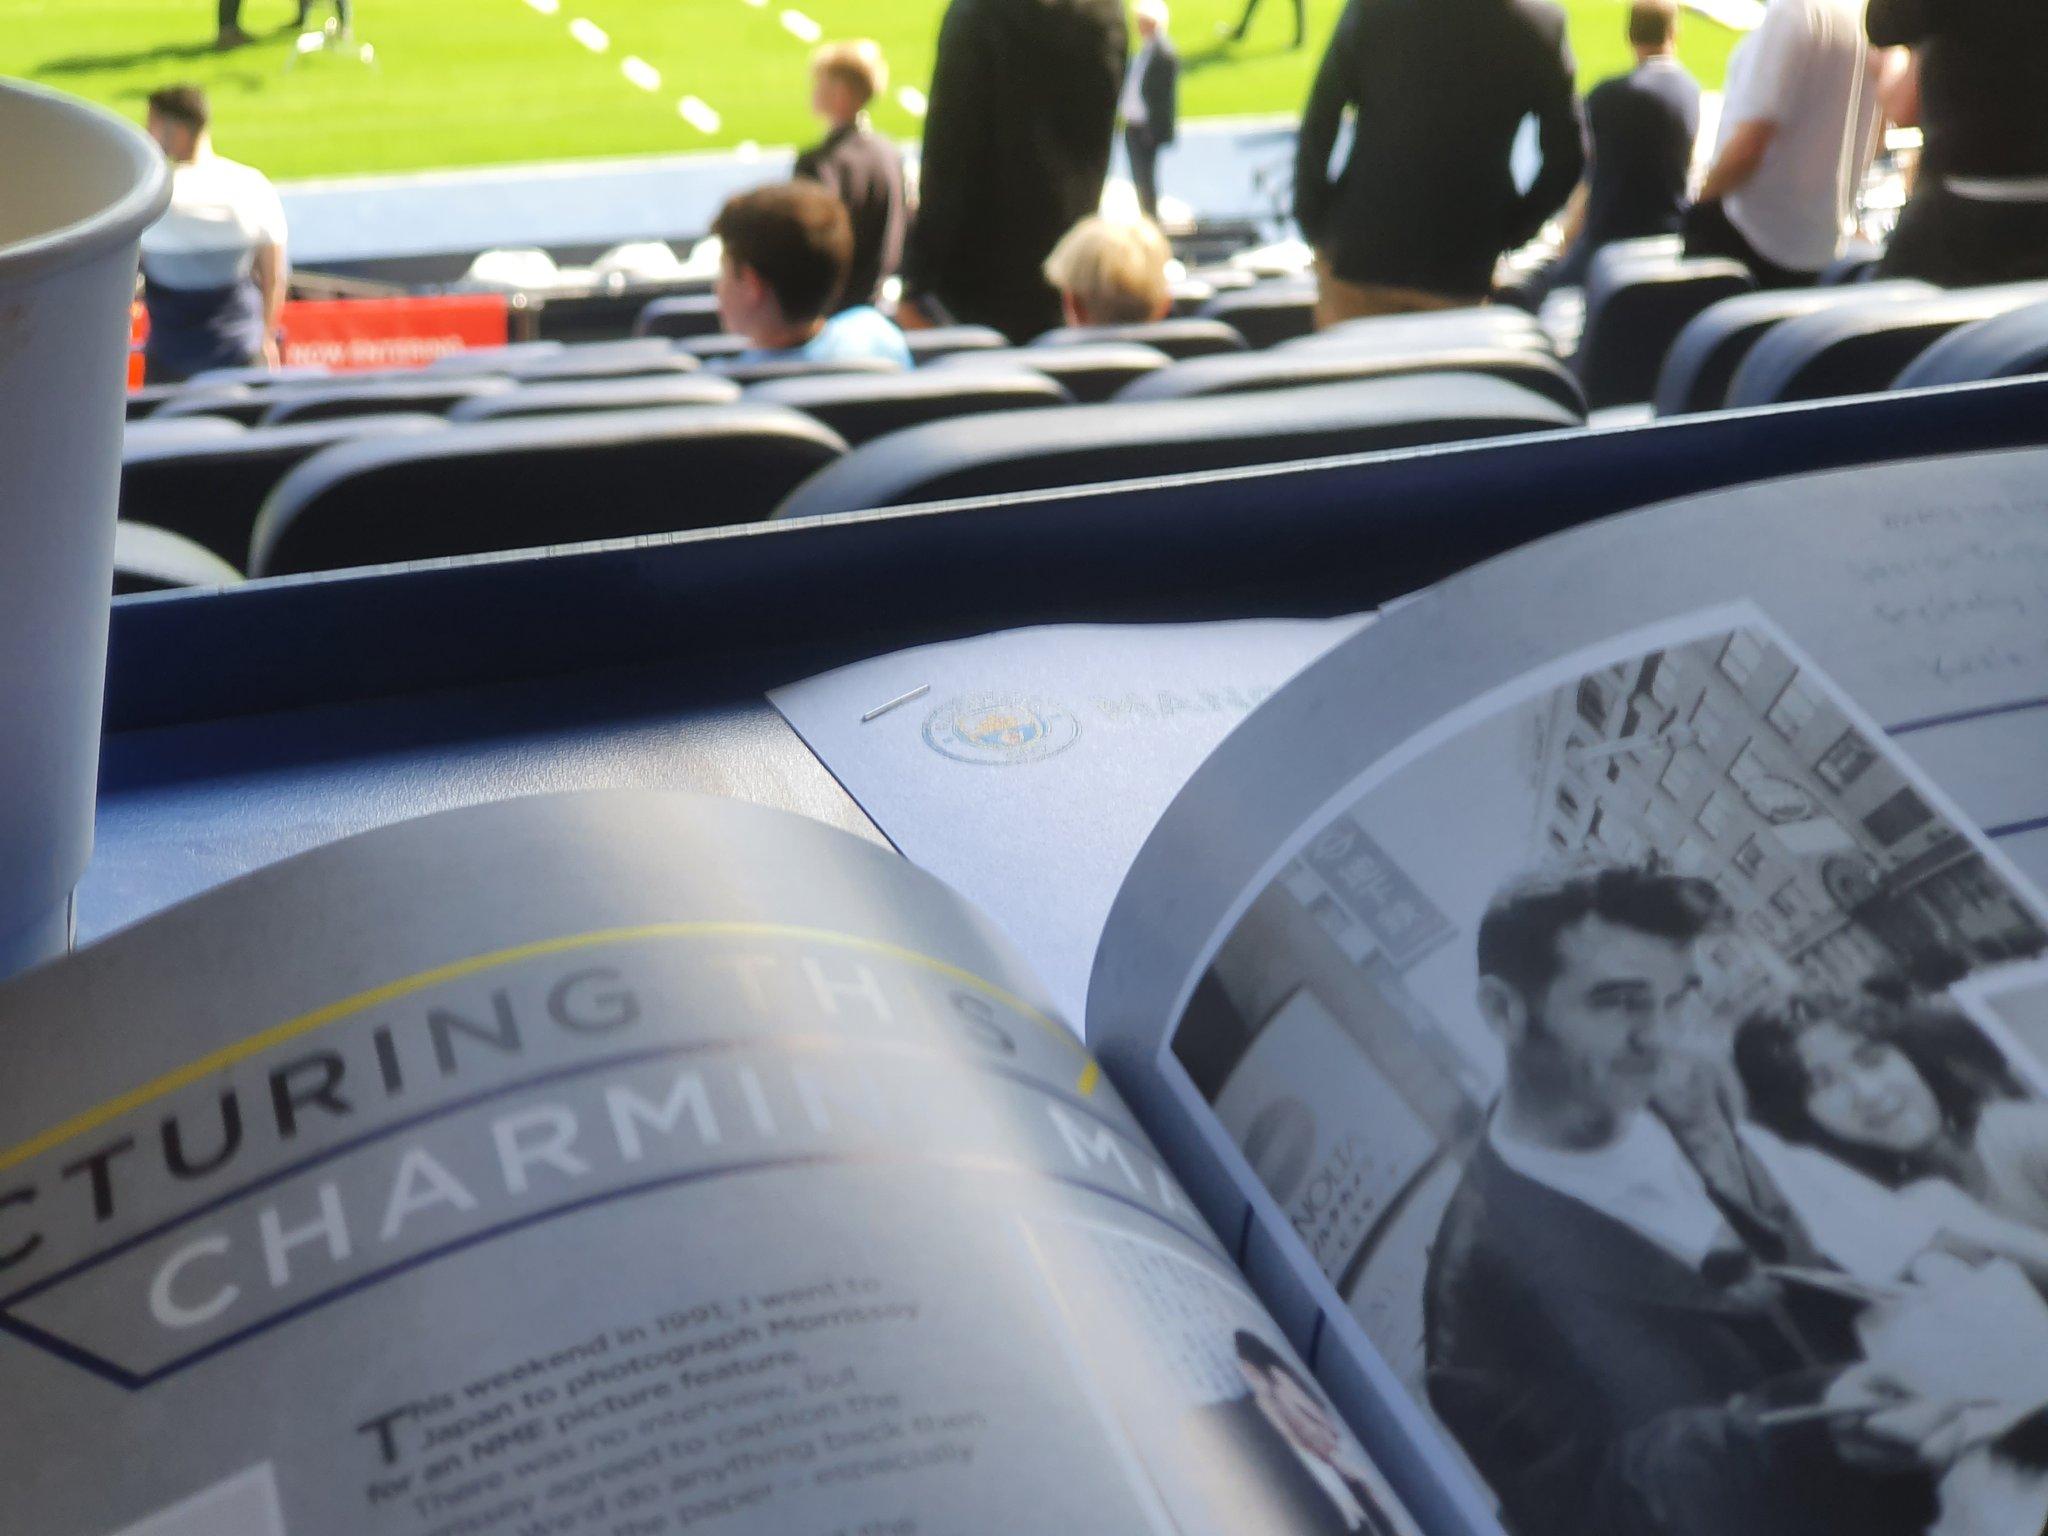 Morrissey KC Man City vs Arsenal matchday programme 28th August 2021.jpg